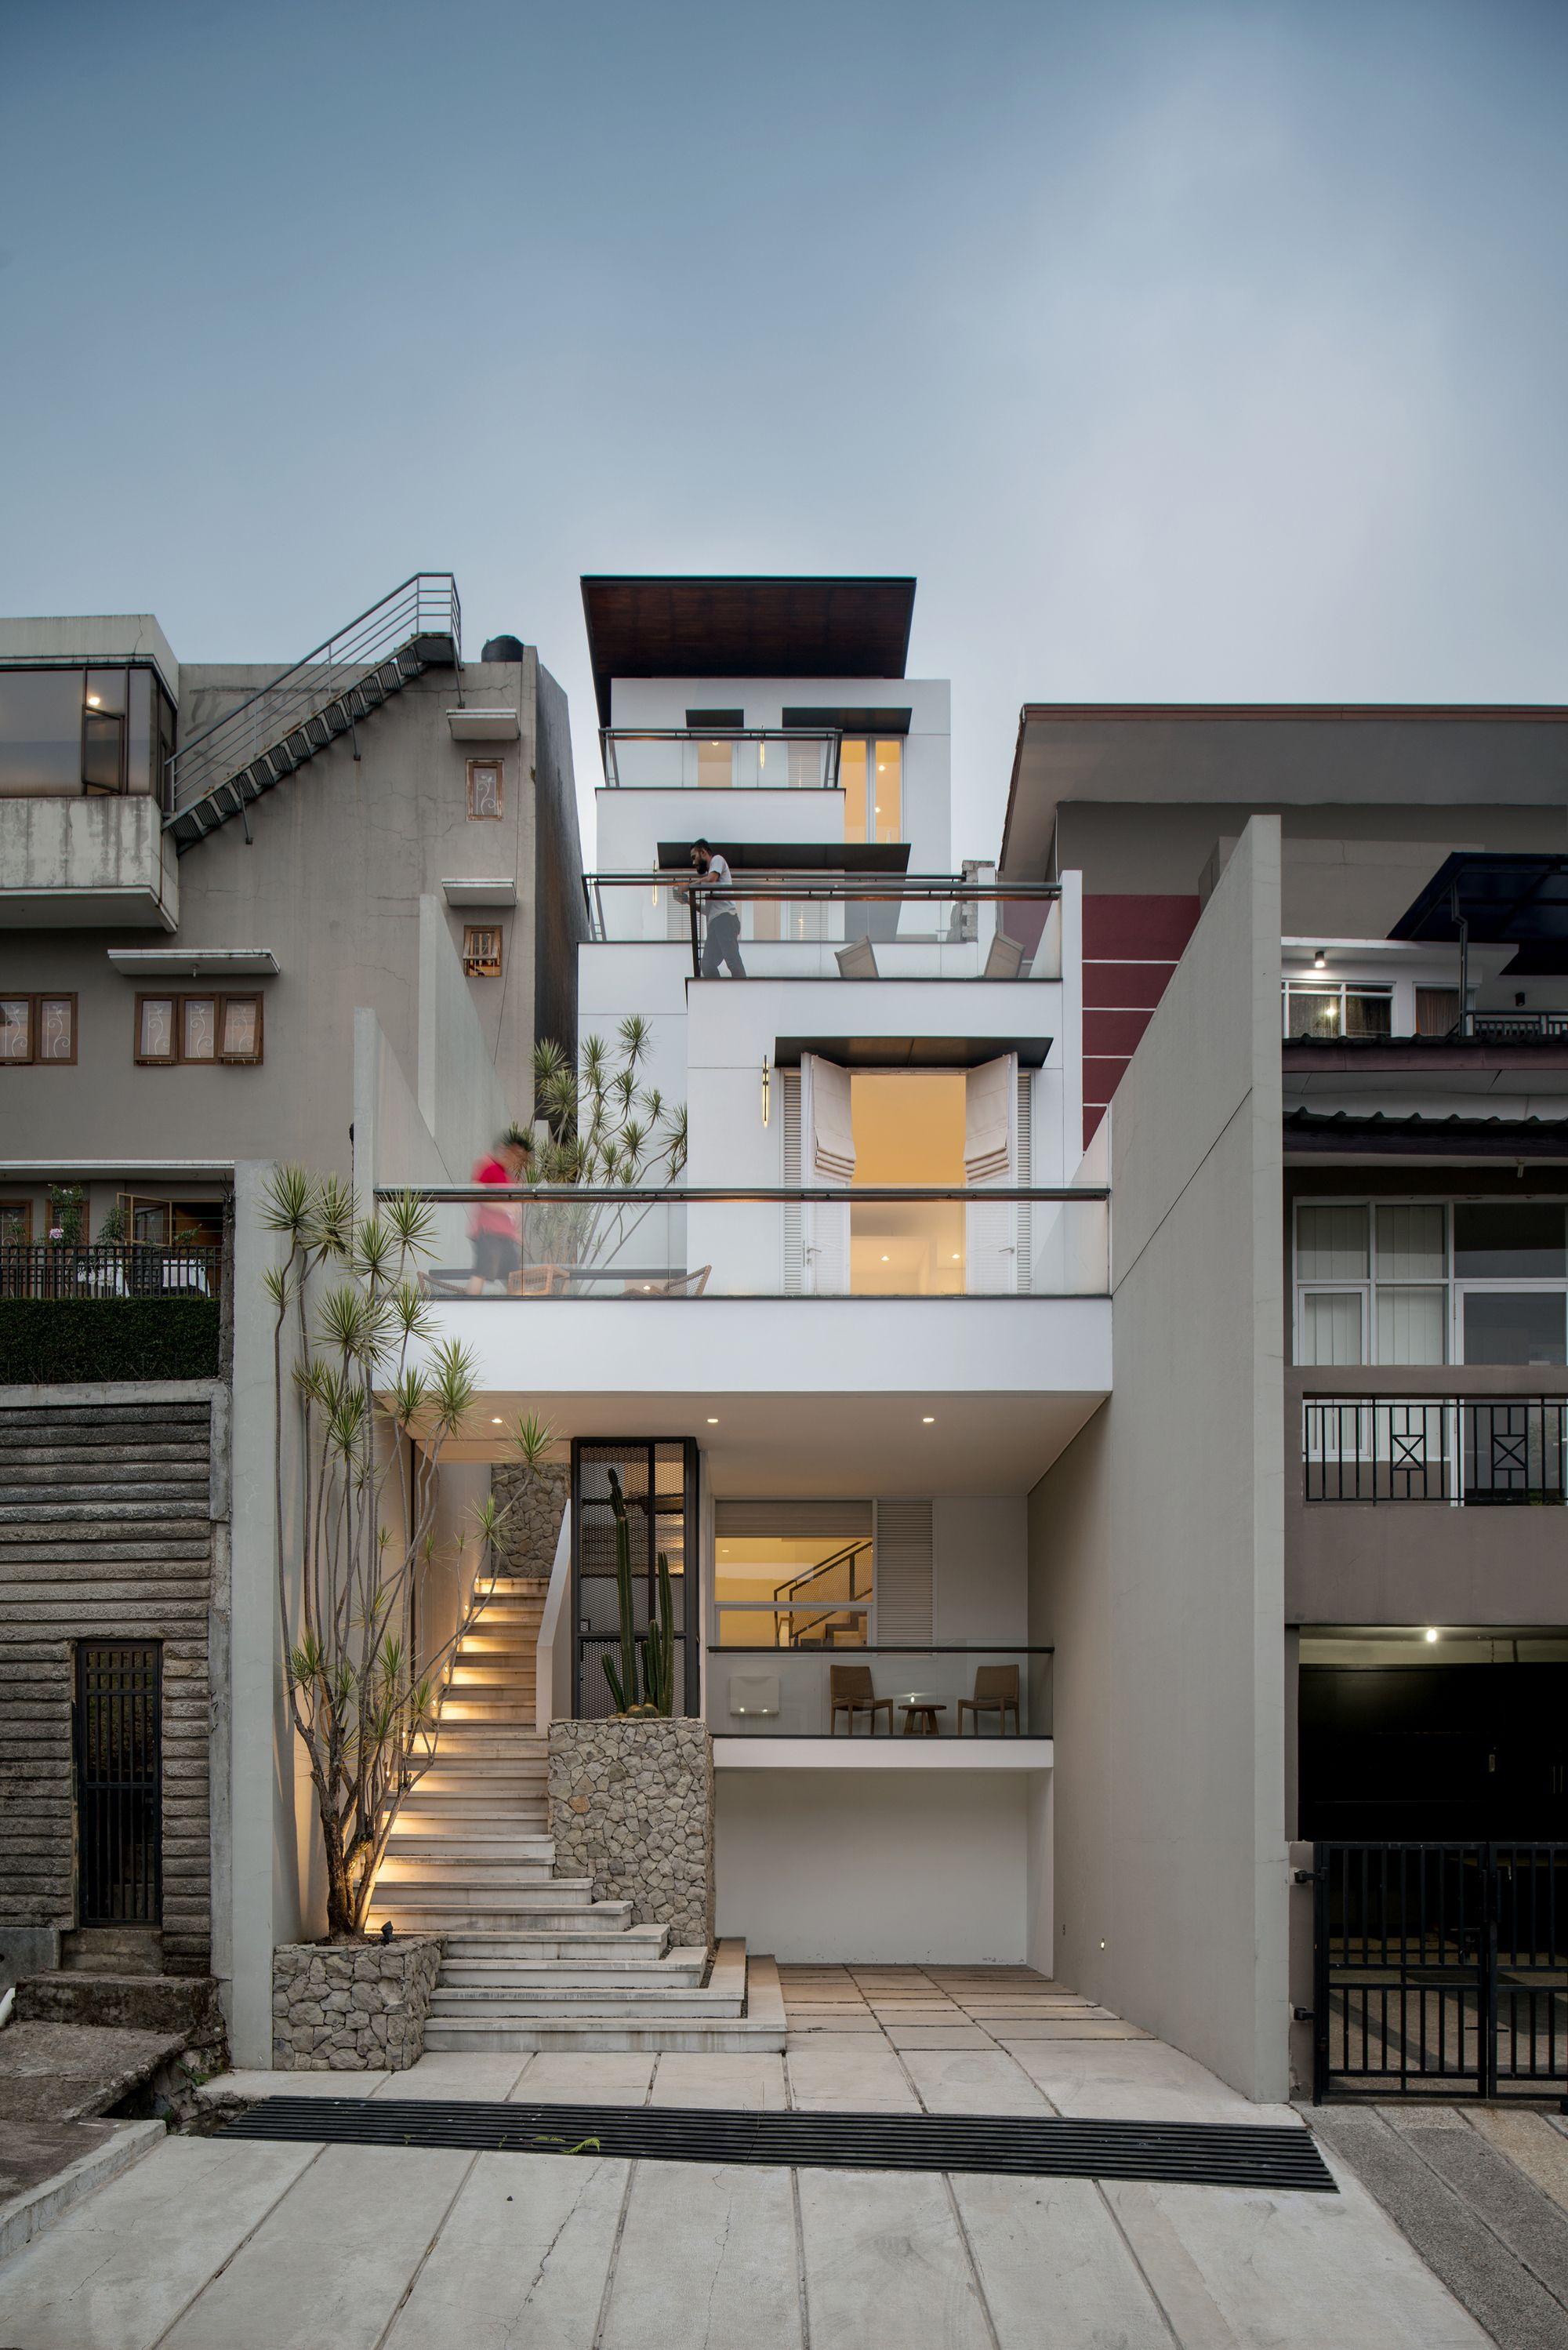 49 Most Popular Modern Dream House Exterior Design Ideas 3: Modern House Design, Tiny House Design, House Front Design